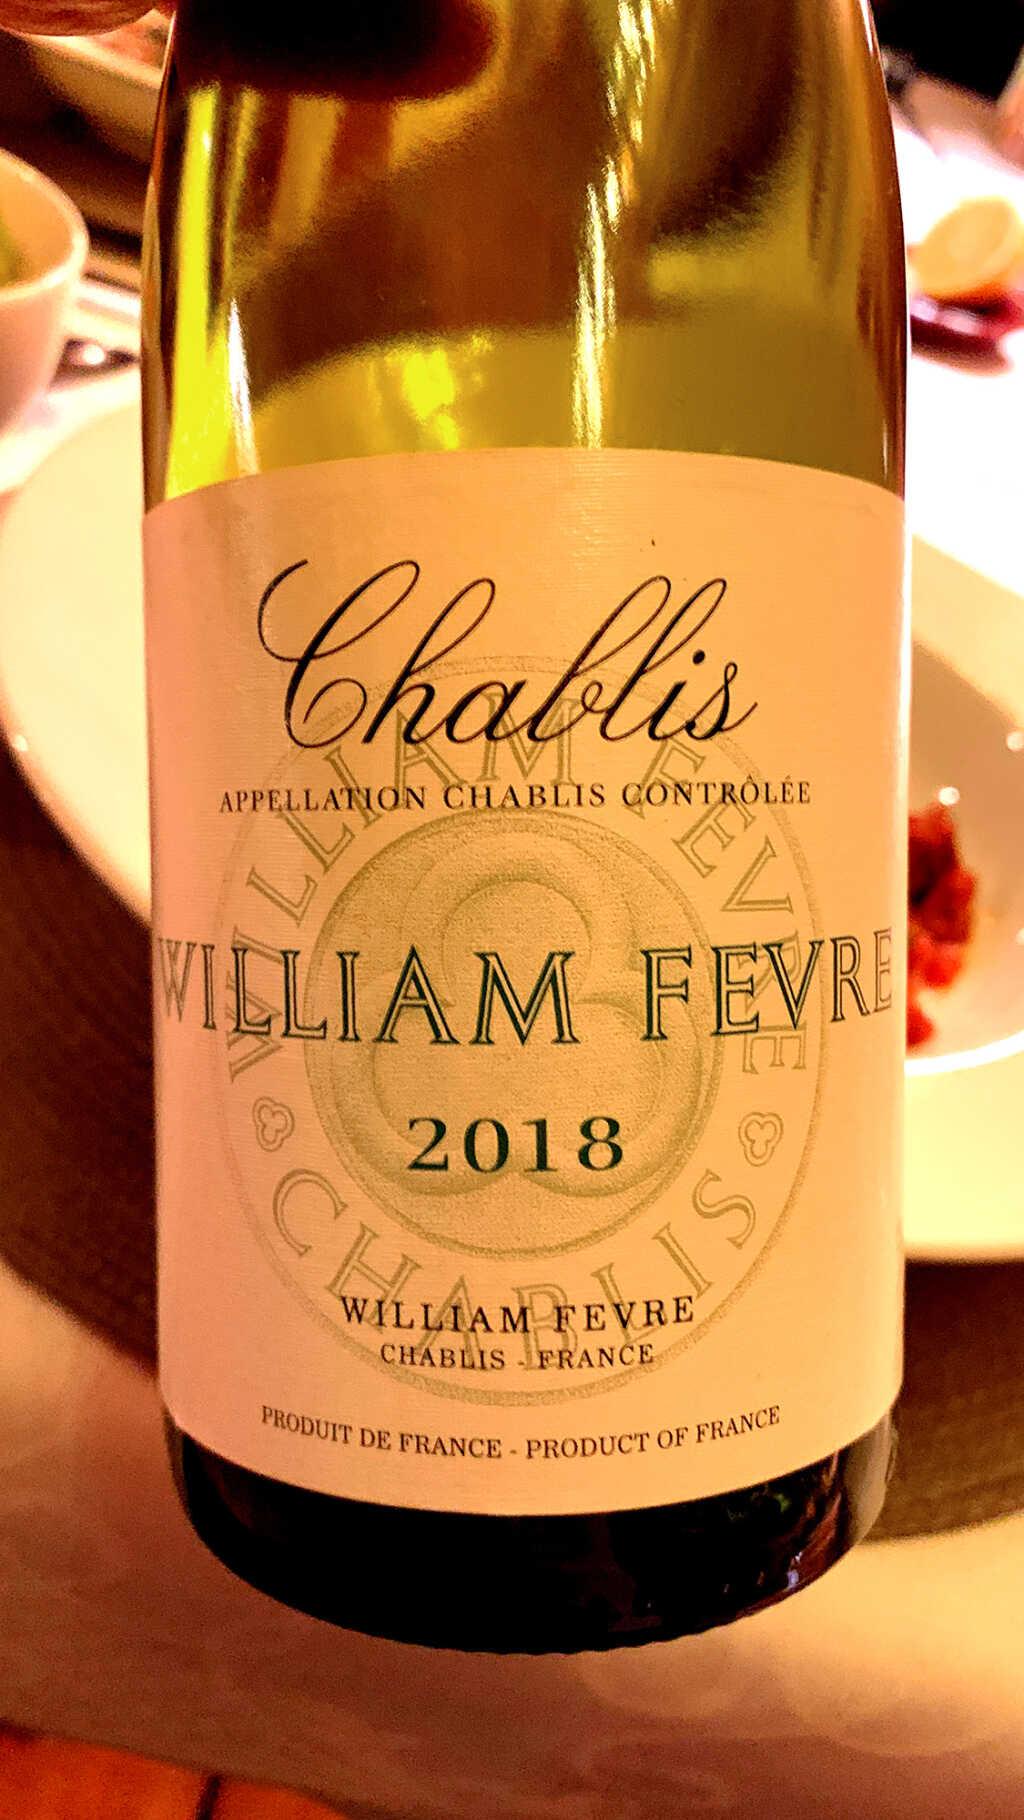 2018 Chablis, Chardonnay, Domaine William Fevre, Chablis, Frankreich